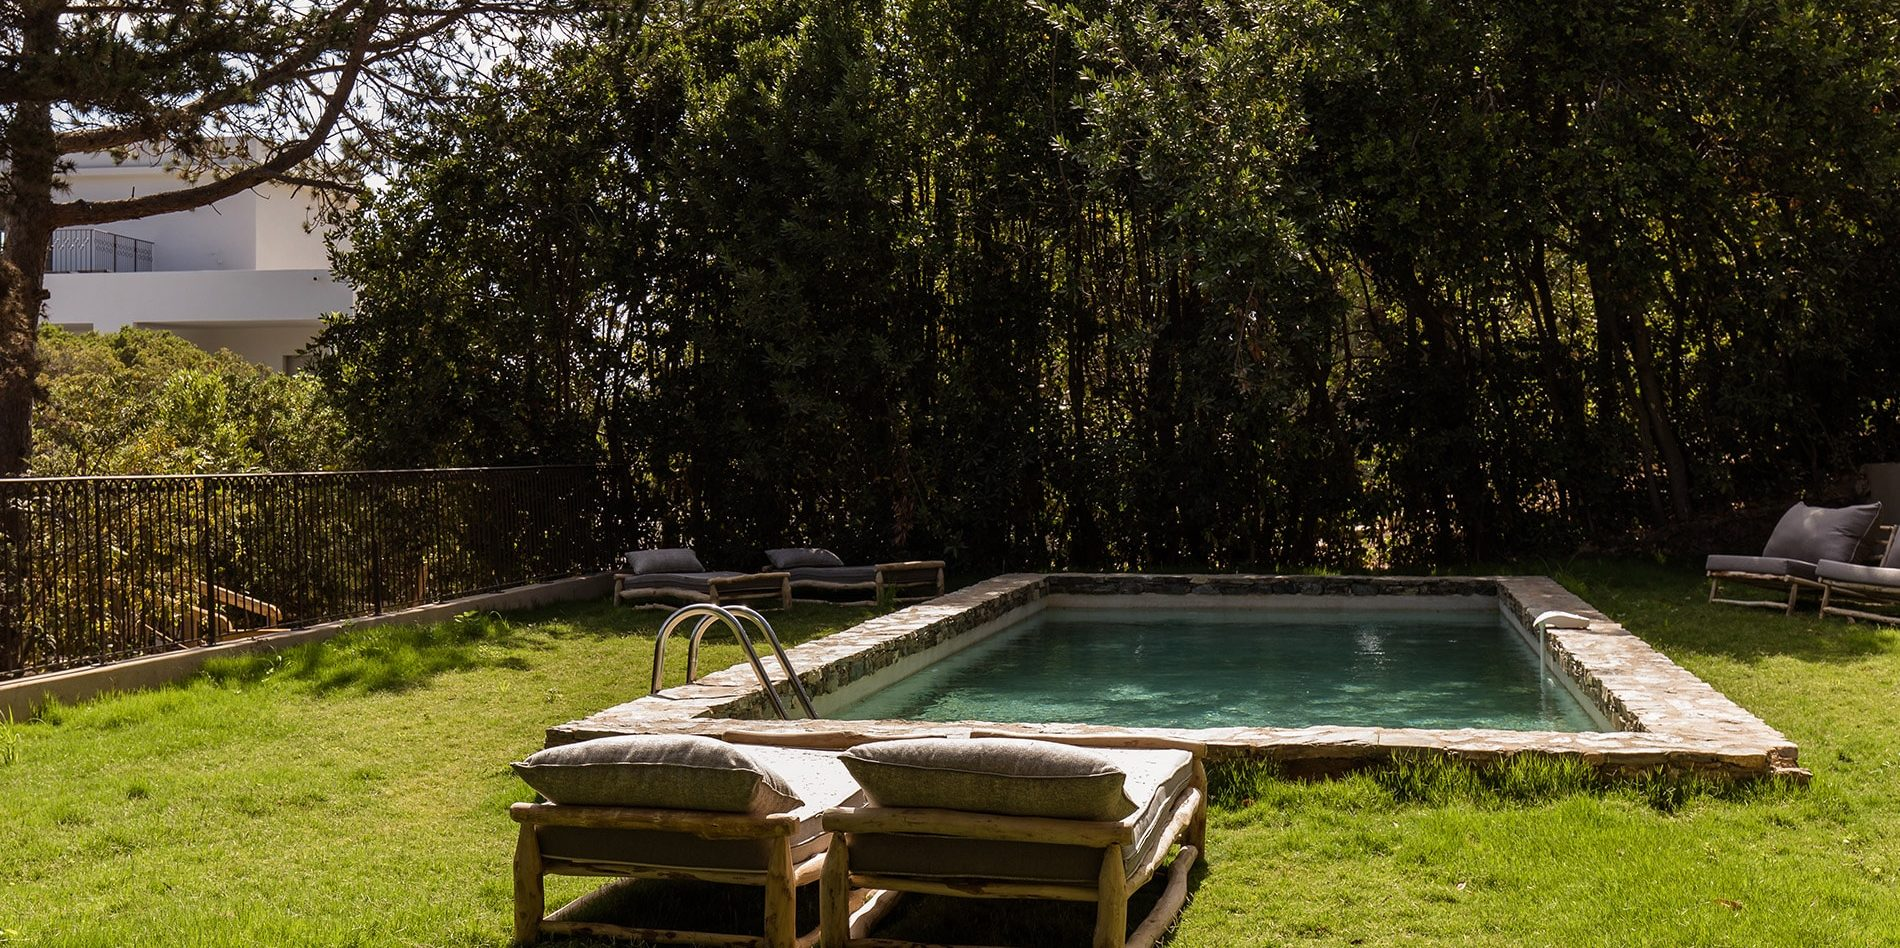 Hotel Misincu Cagnano Cap Corse Corsica Frankrijk privézwembad ligbedden tuin